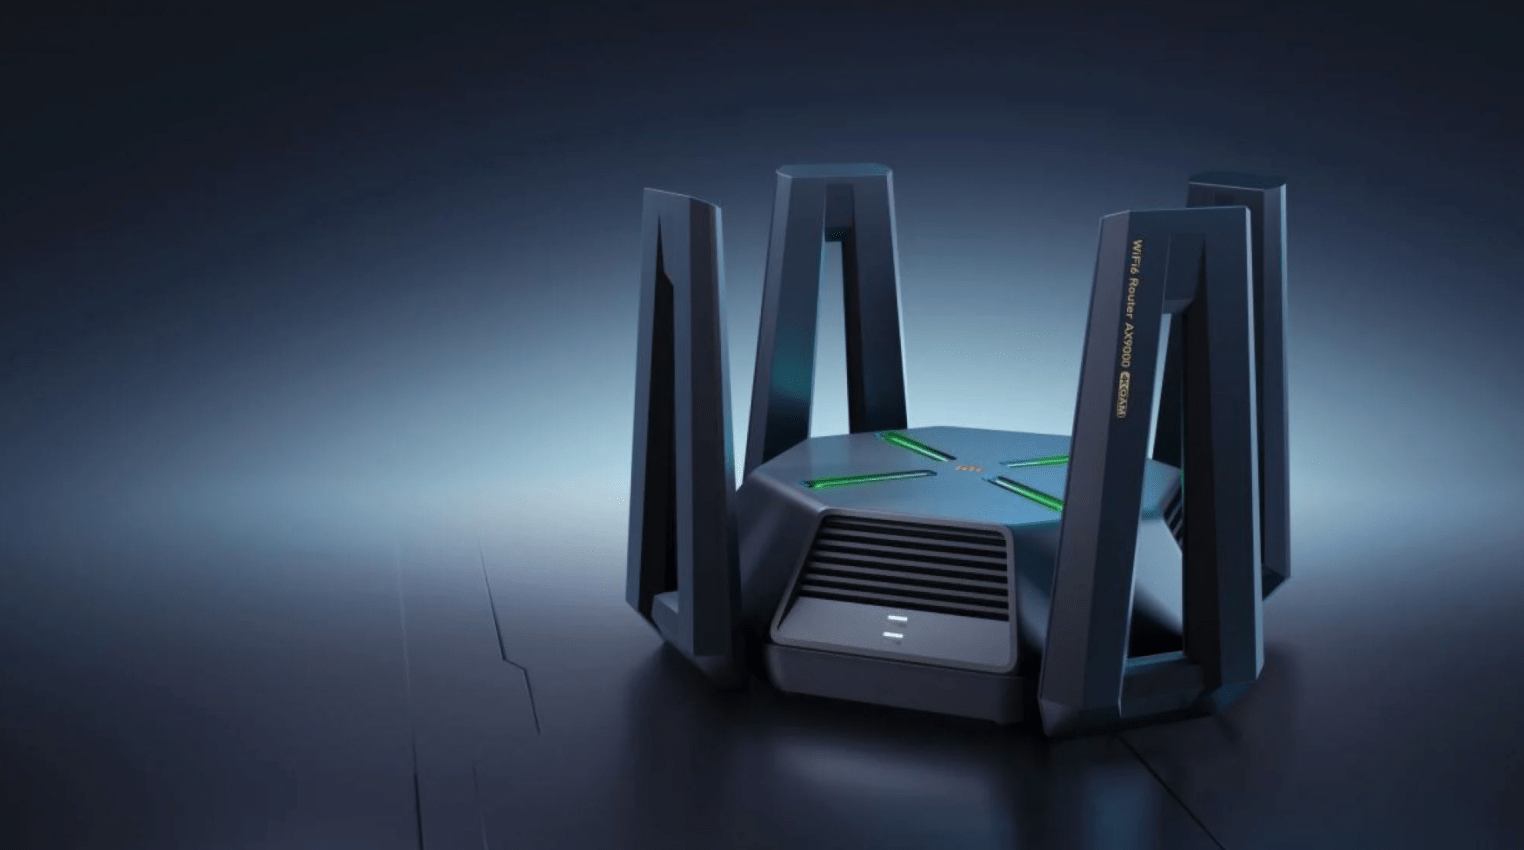 إطلاق راوتر Mi AX9000 من شاومي